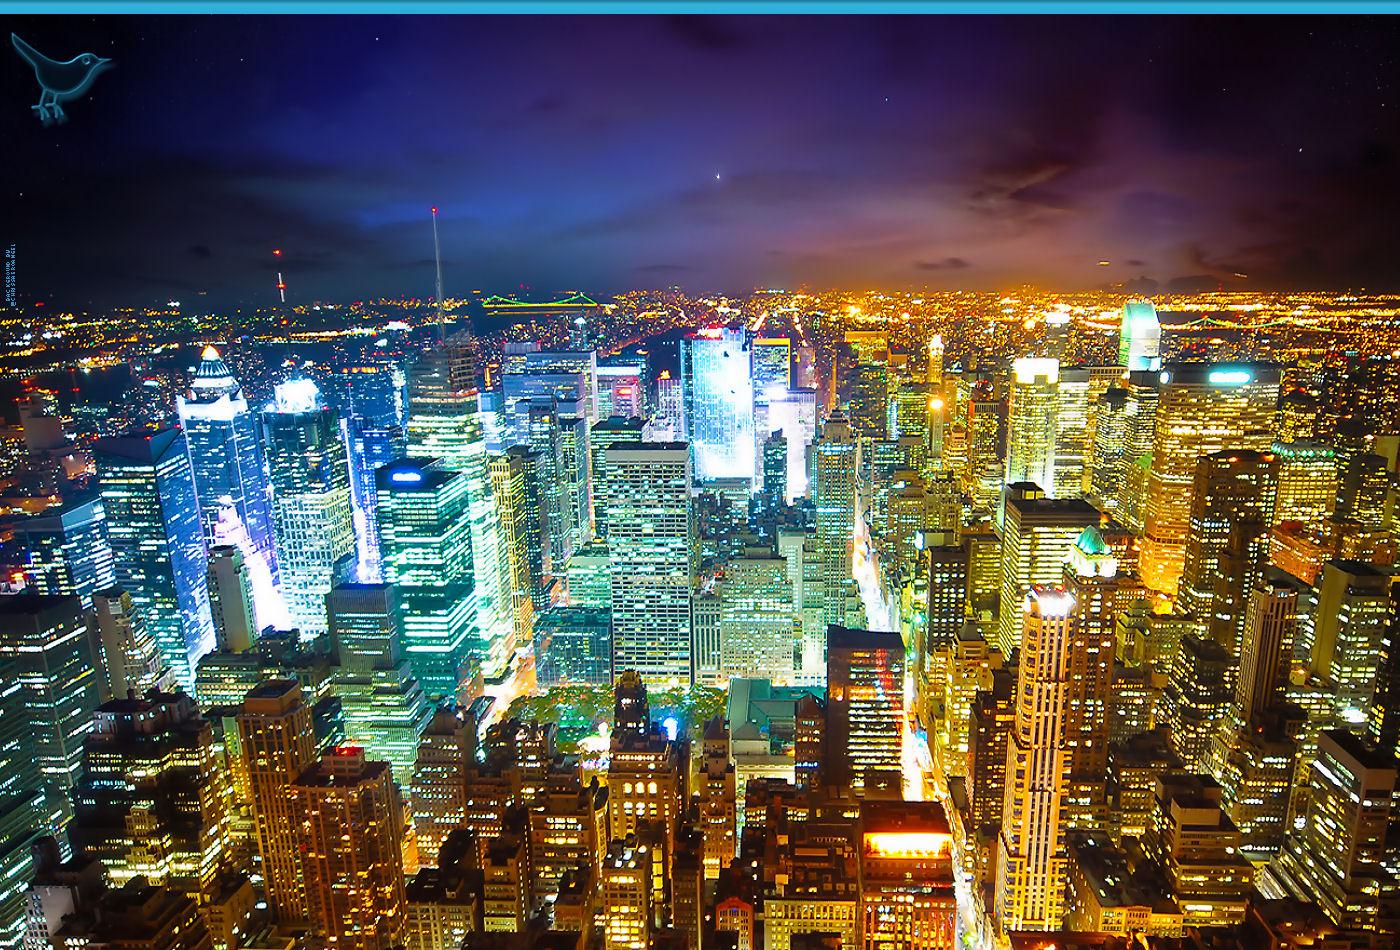 City Lights Twitter Backgrounds City Lights Twitter Themes 1400x950